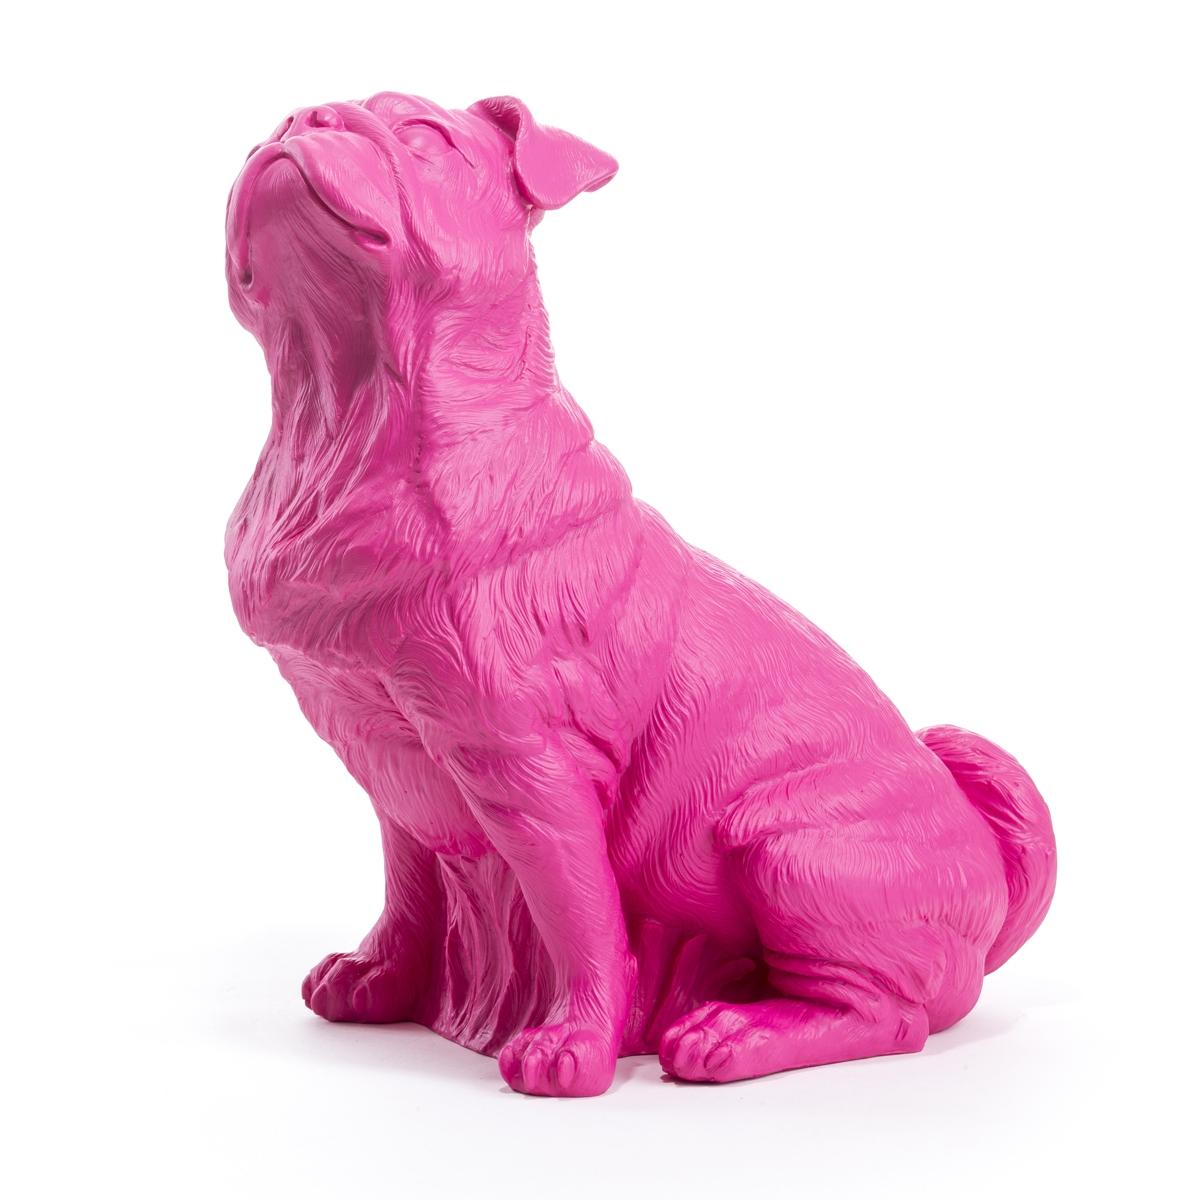 Le Carlin, Pug